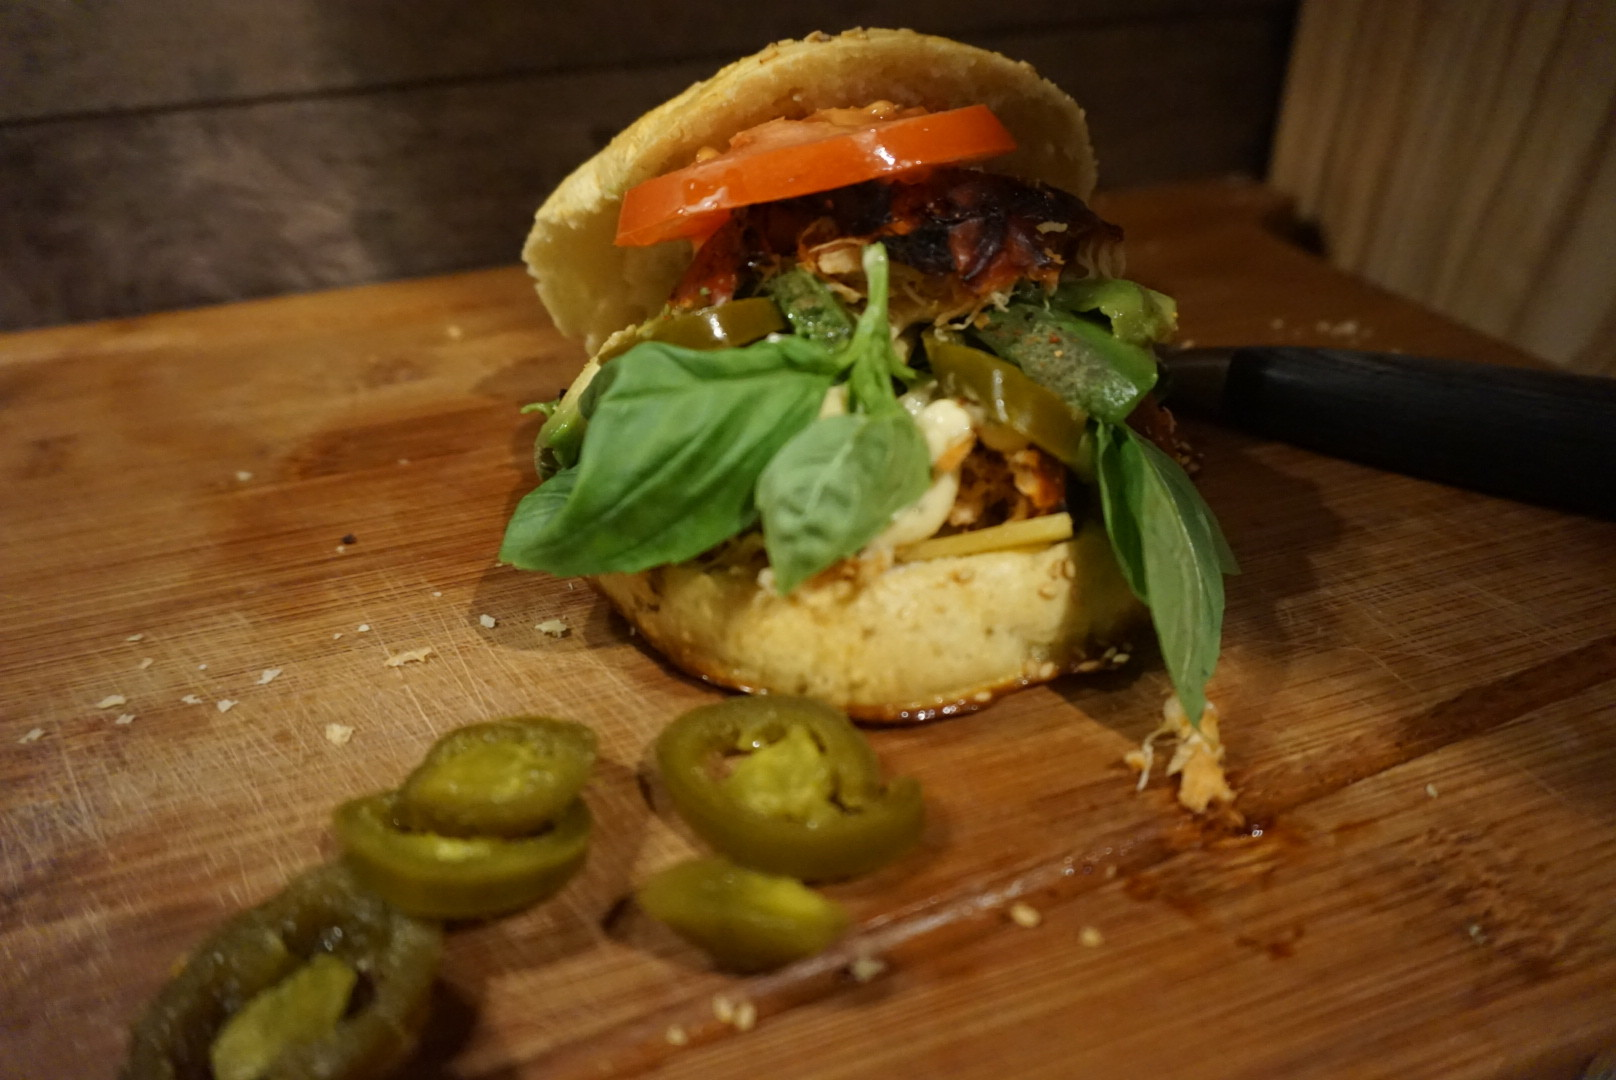 rezept pulled chicken burger avocado zwiebeln low carb foodblog. Black Bedroom Furniture Sets. Home Design Ideas